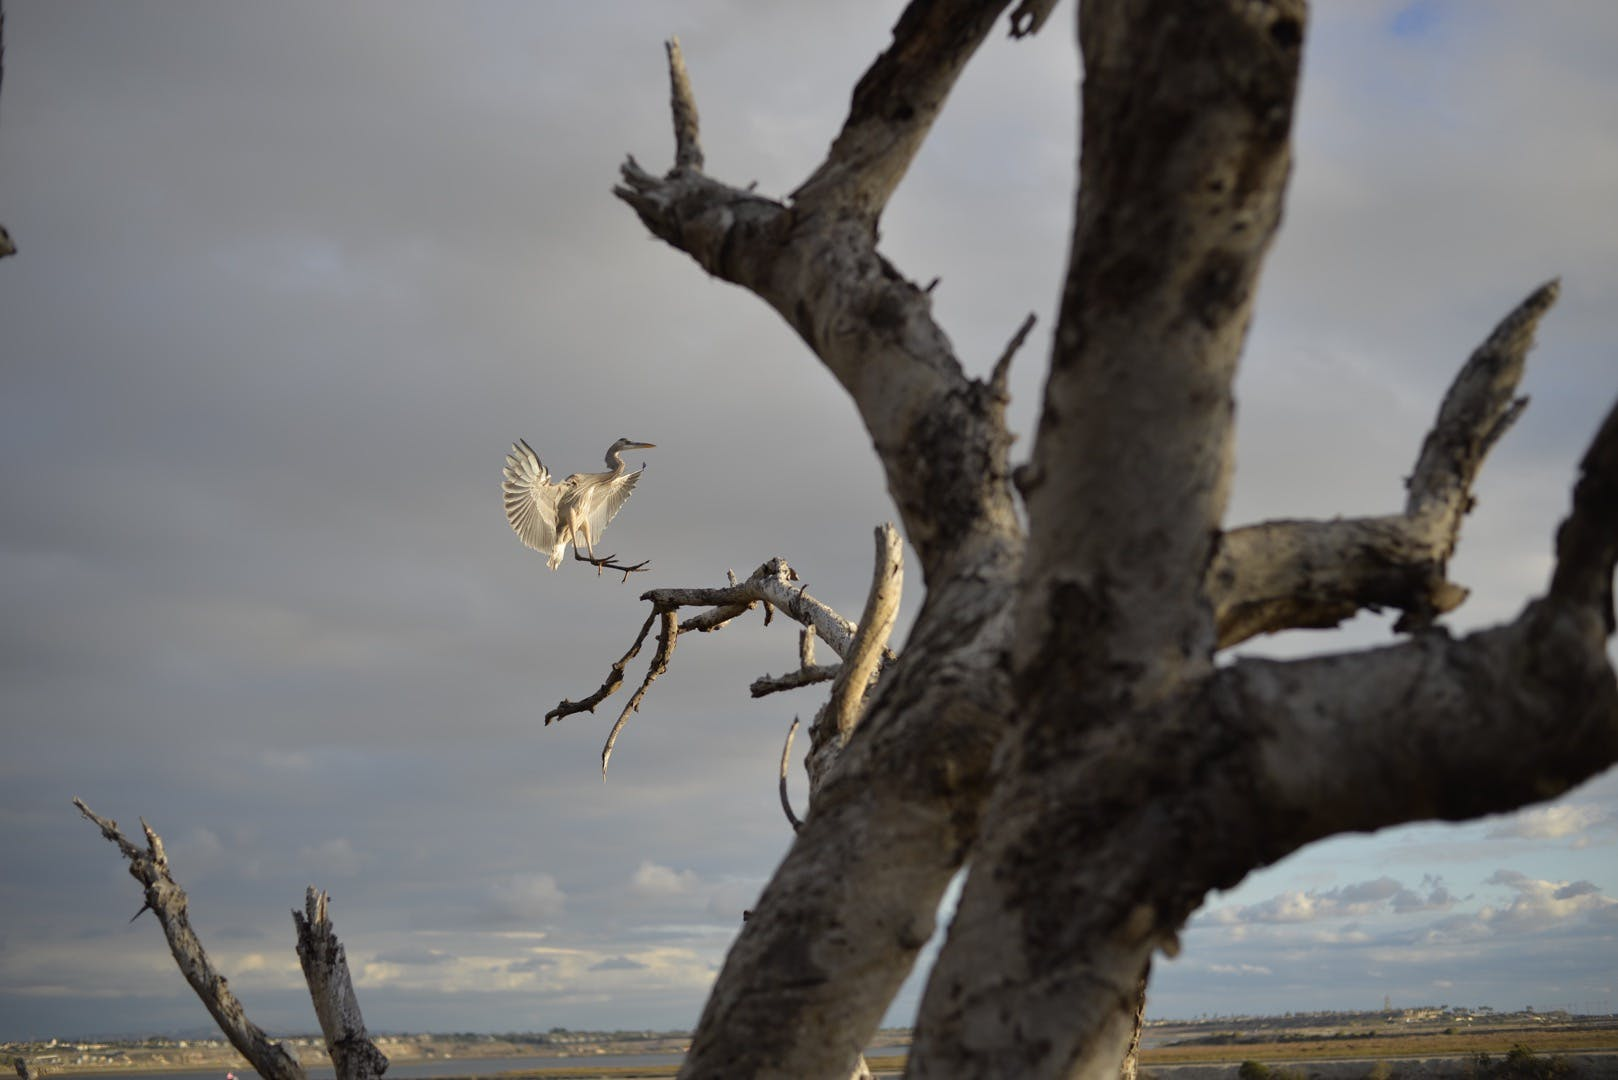 White Bird Near the Tree